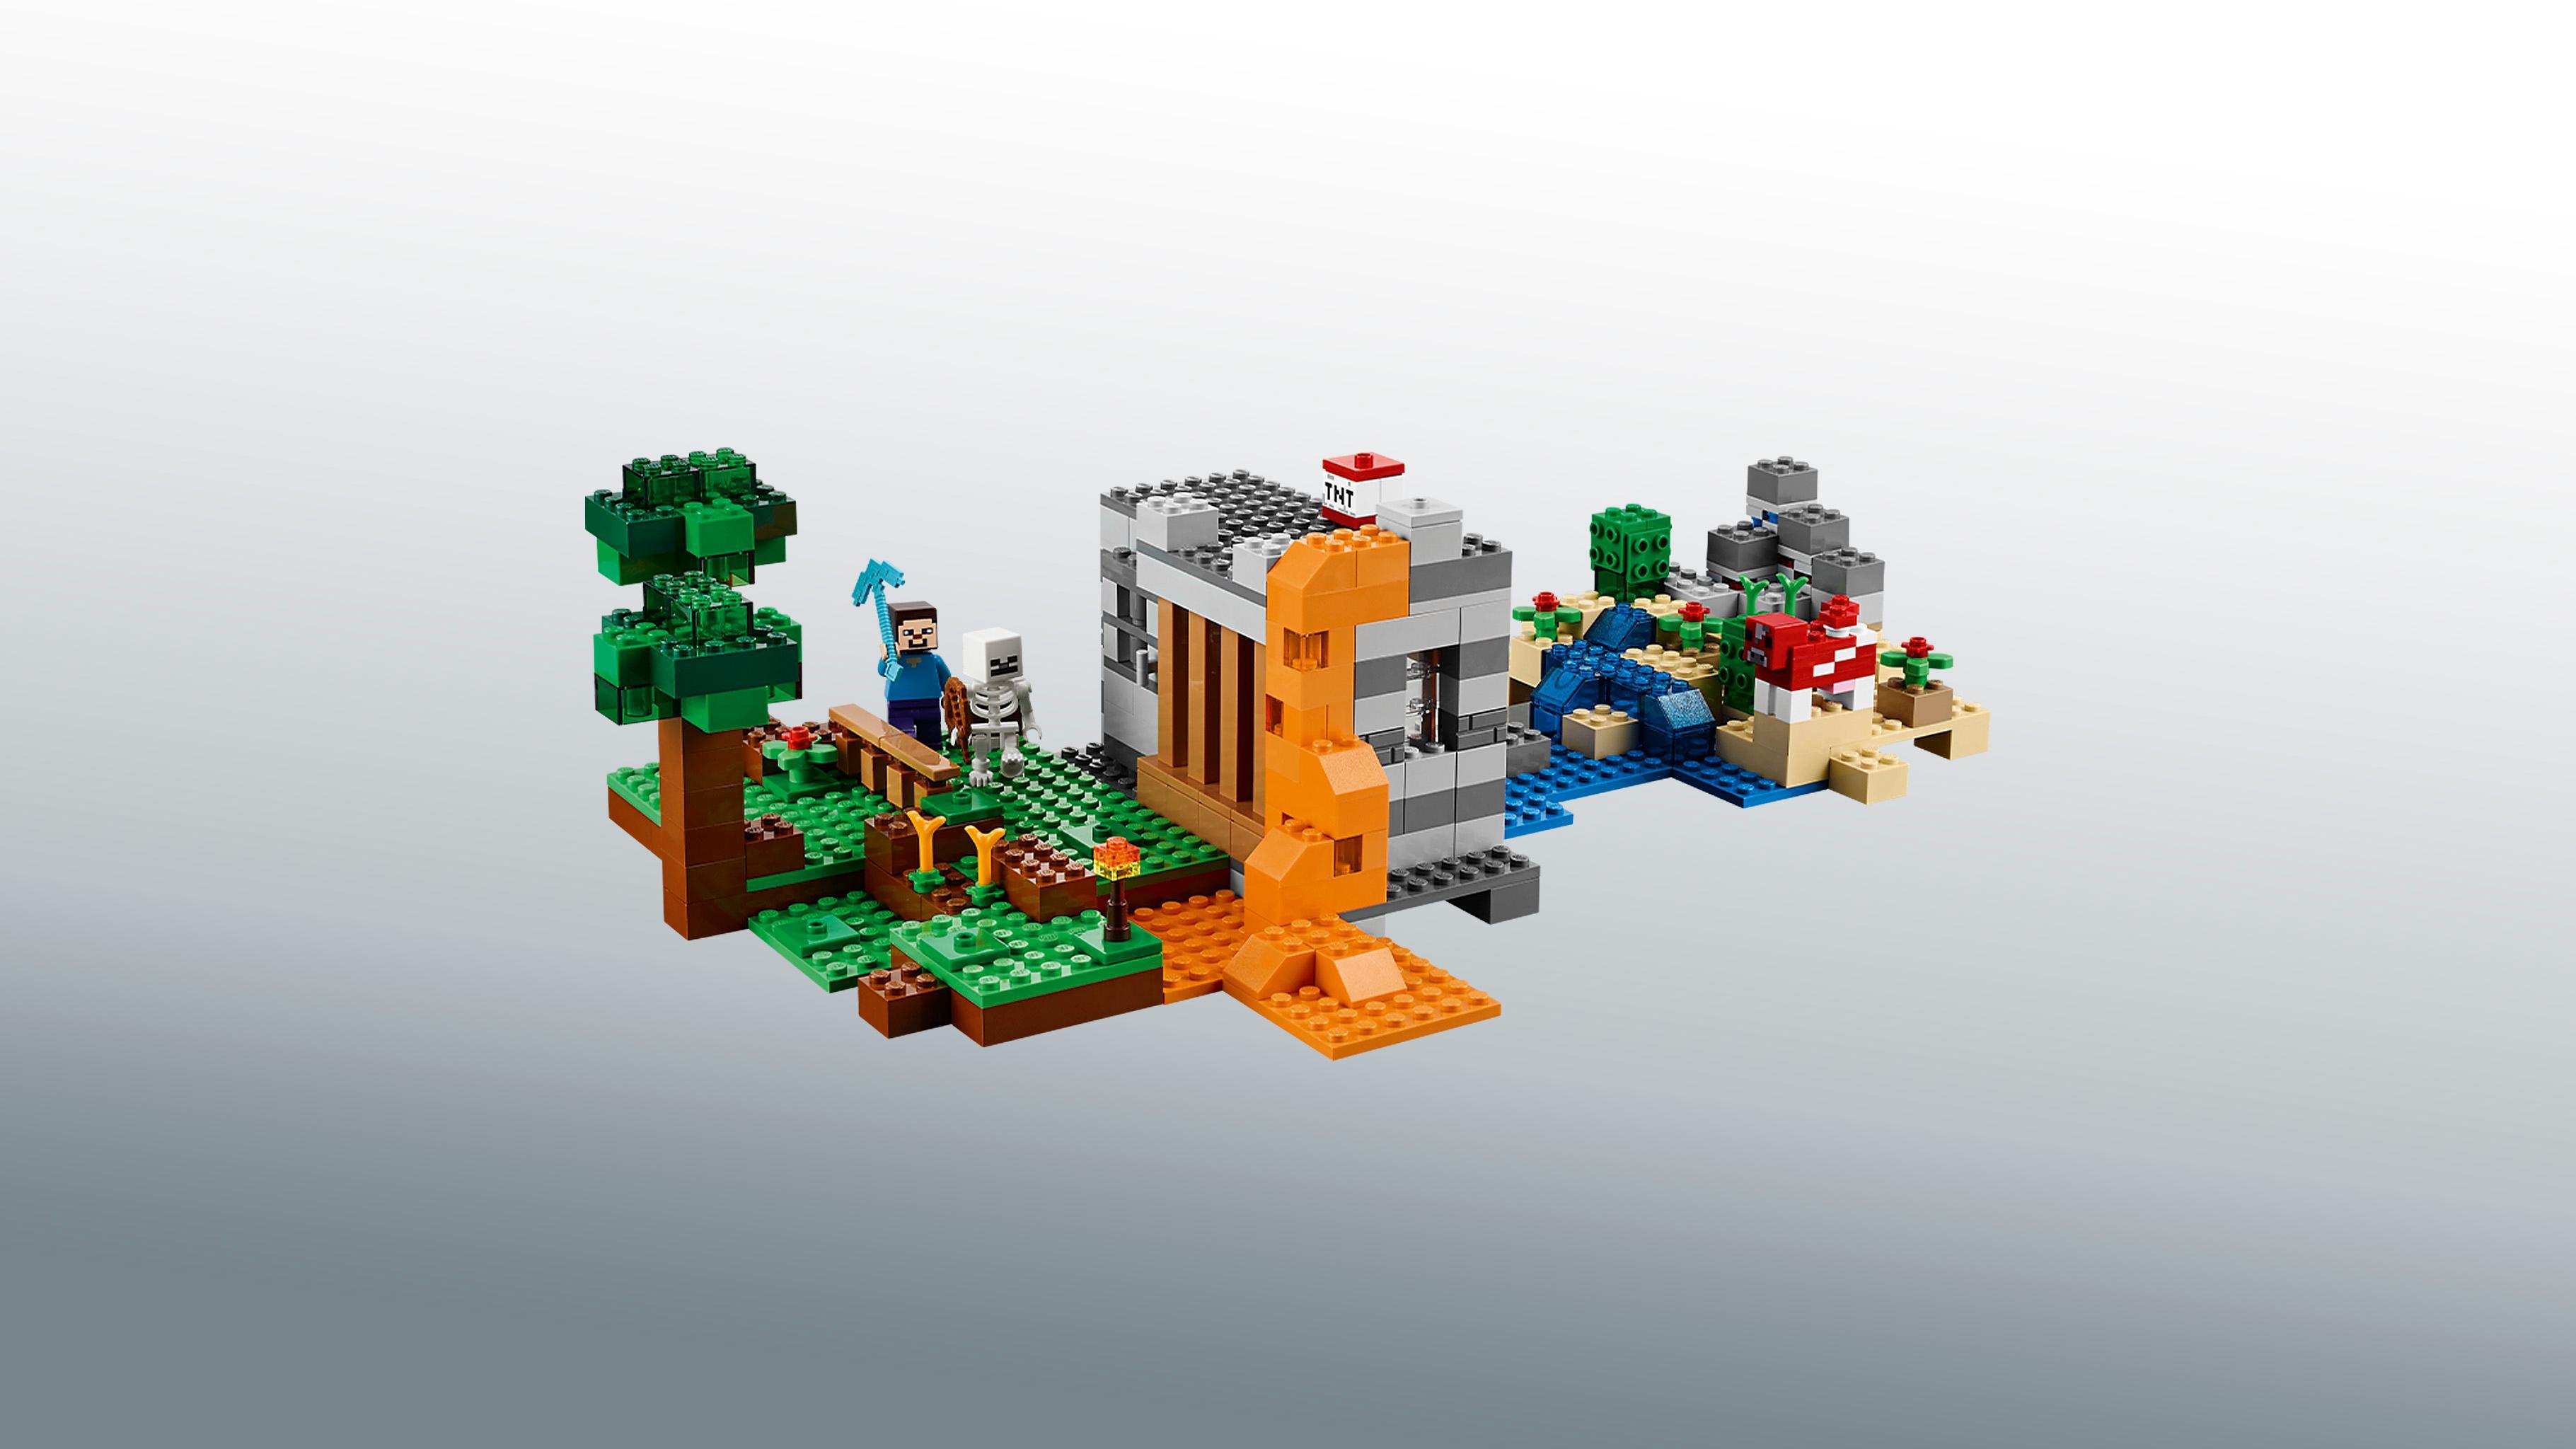 Amazon.com: LEGO 21116 Minecraft Crafting Box: Toys & Games